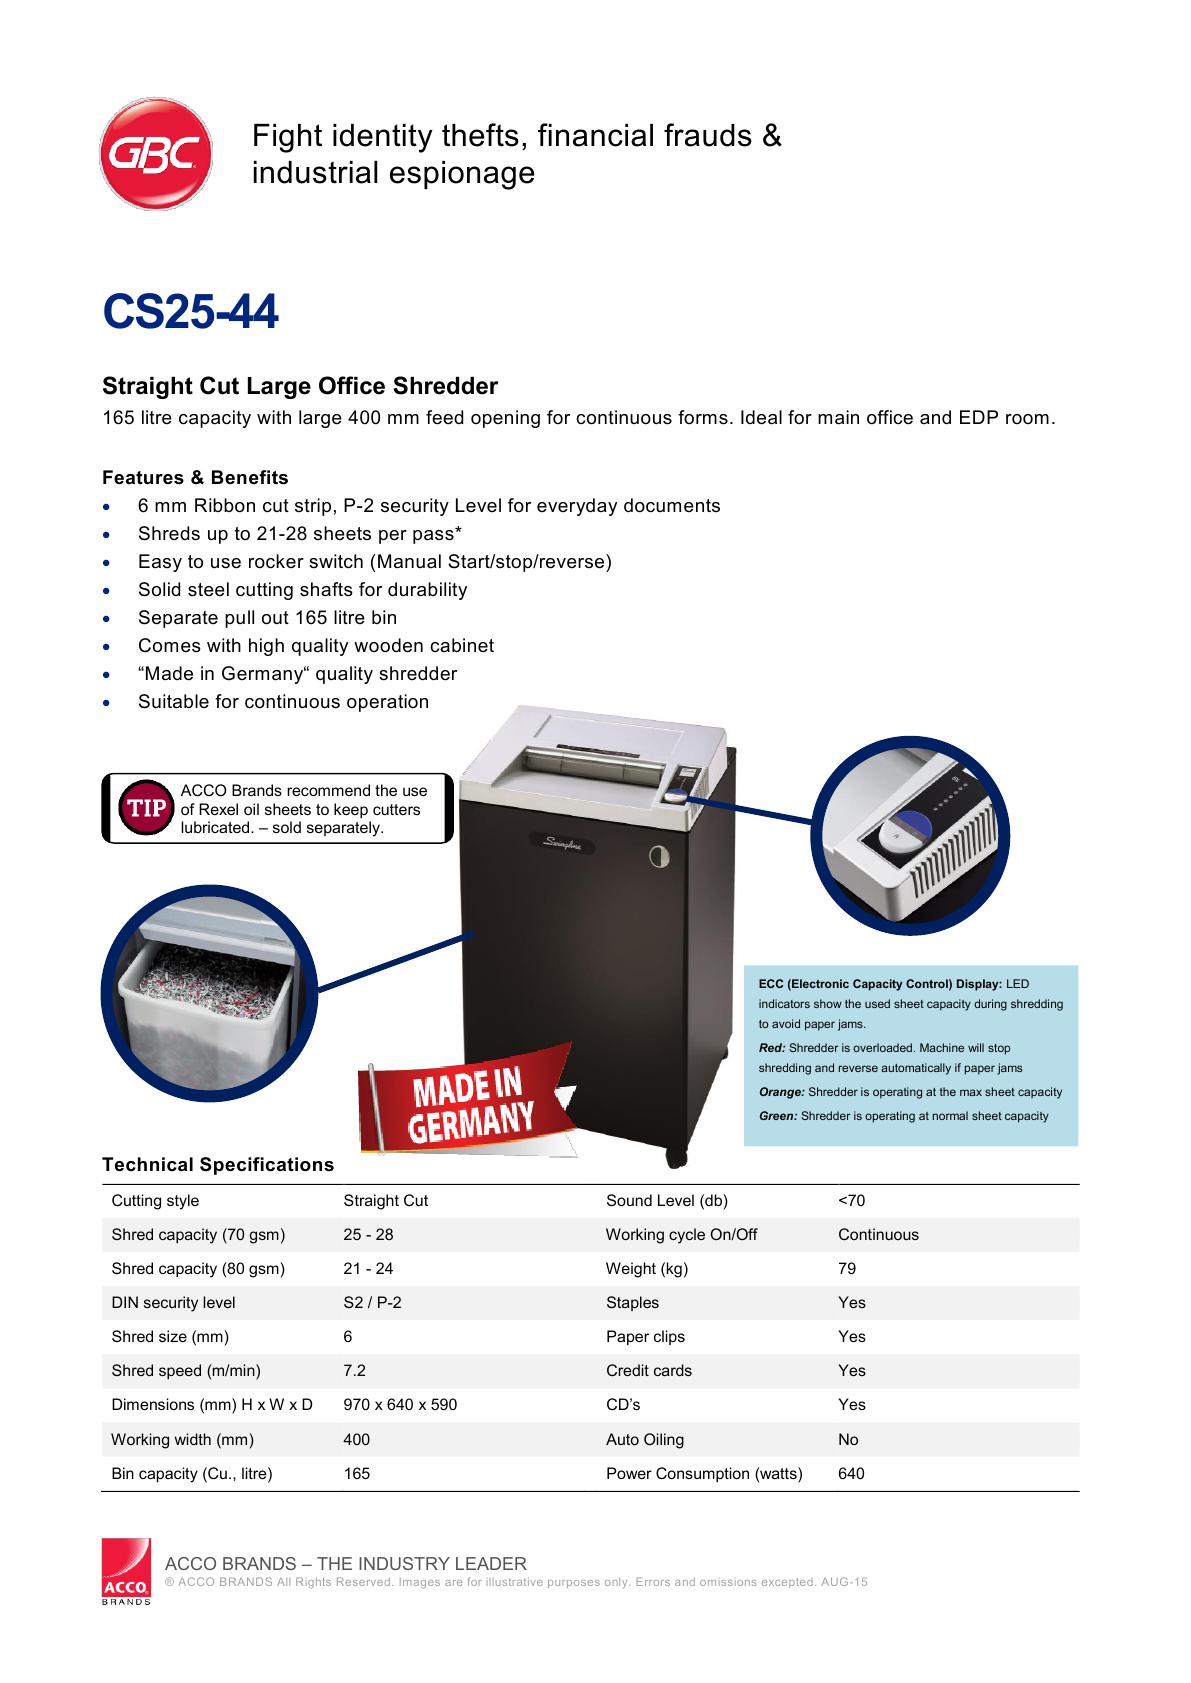 datasheet-cs25-44-1-.png